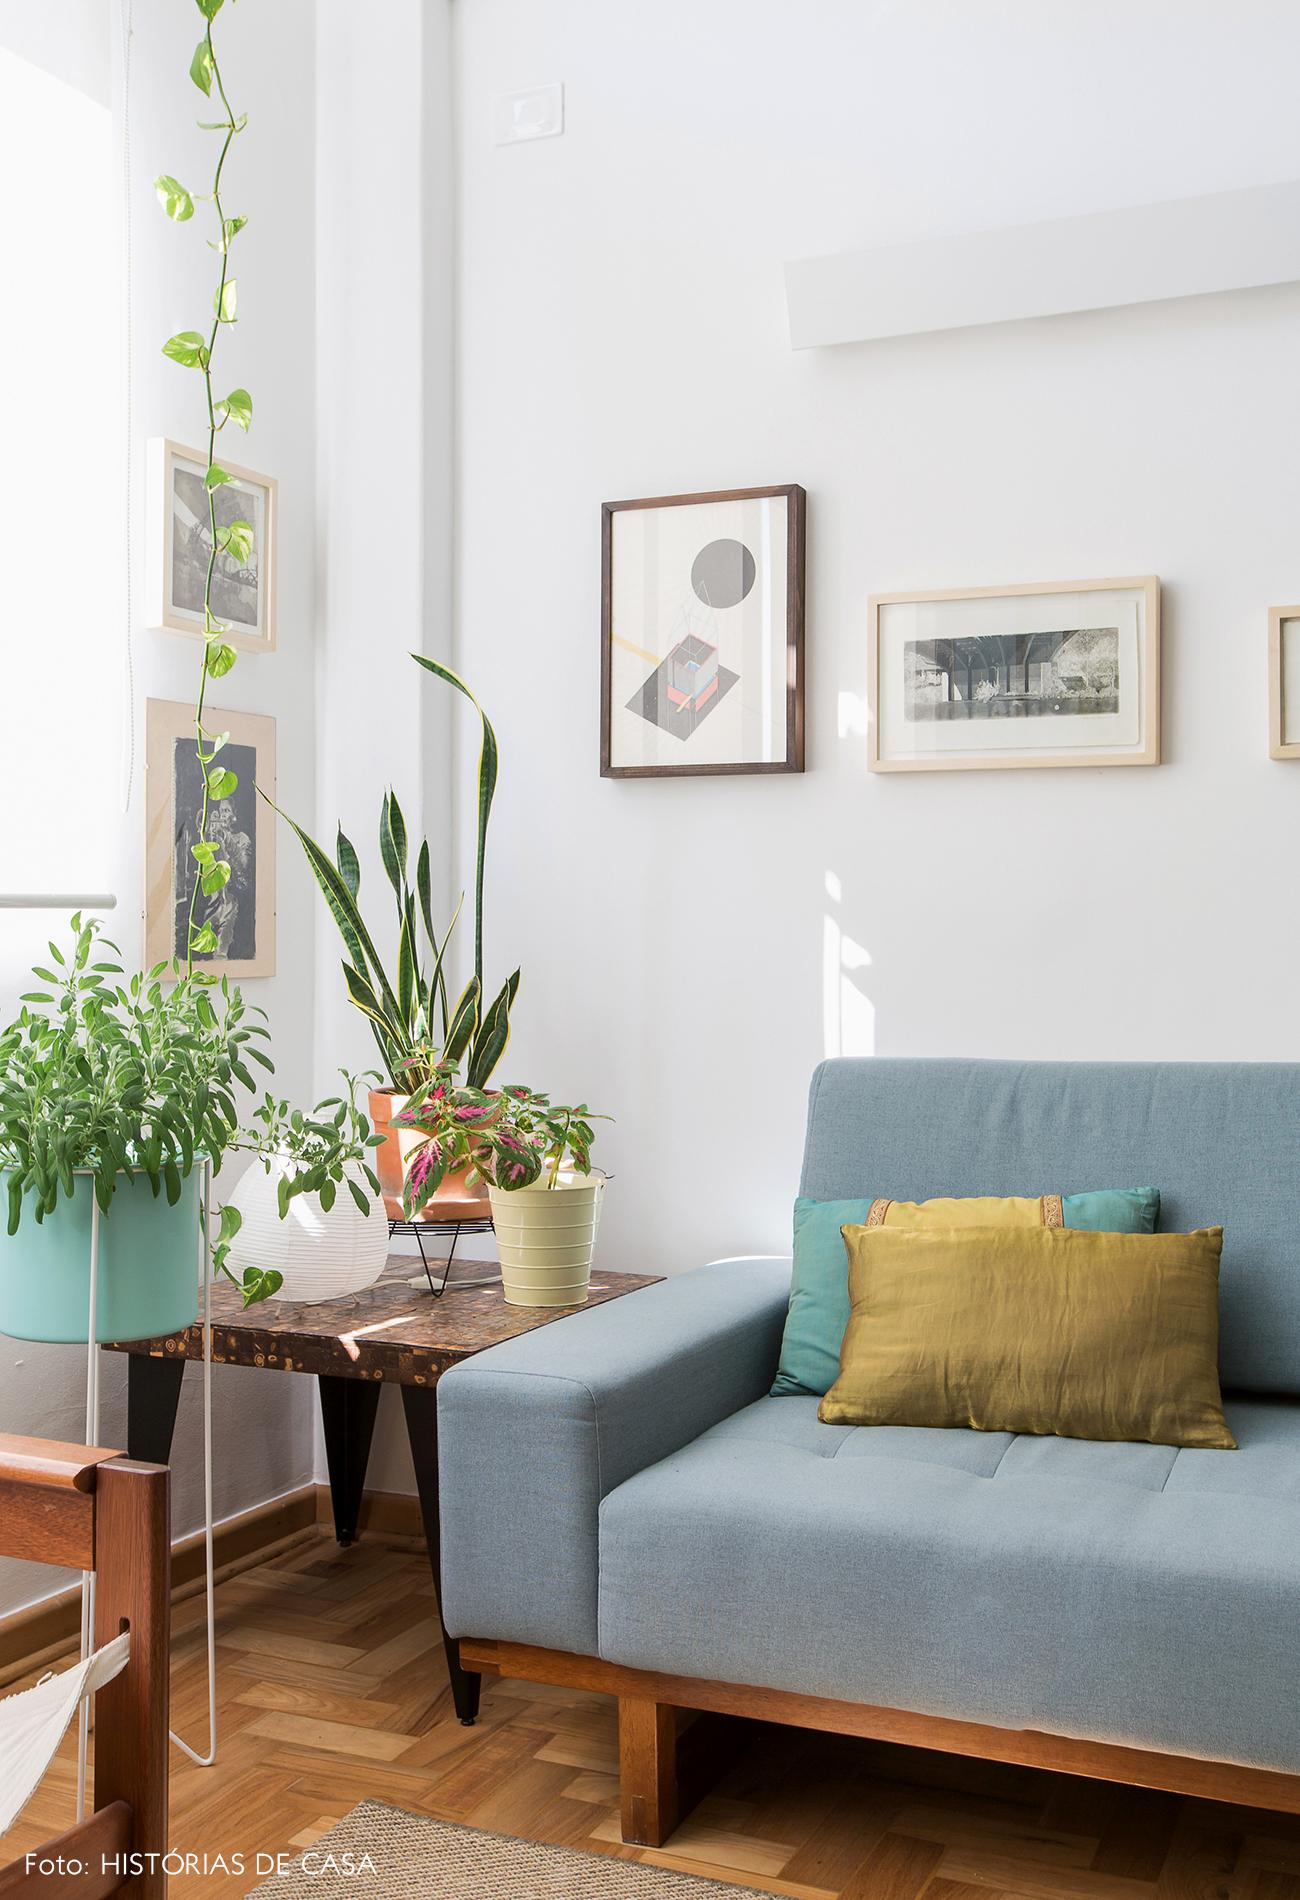 Sofá azul claro da marca Fernando Jaeger